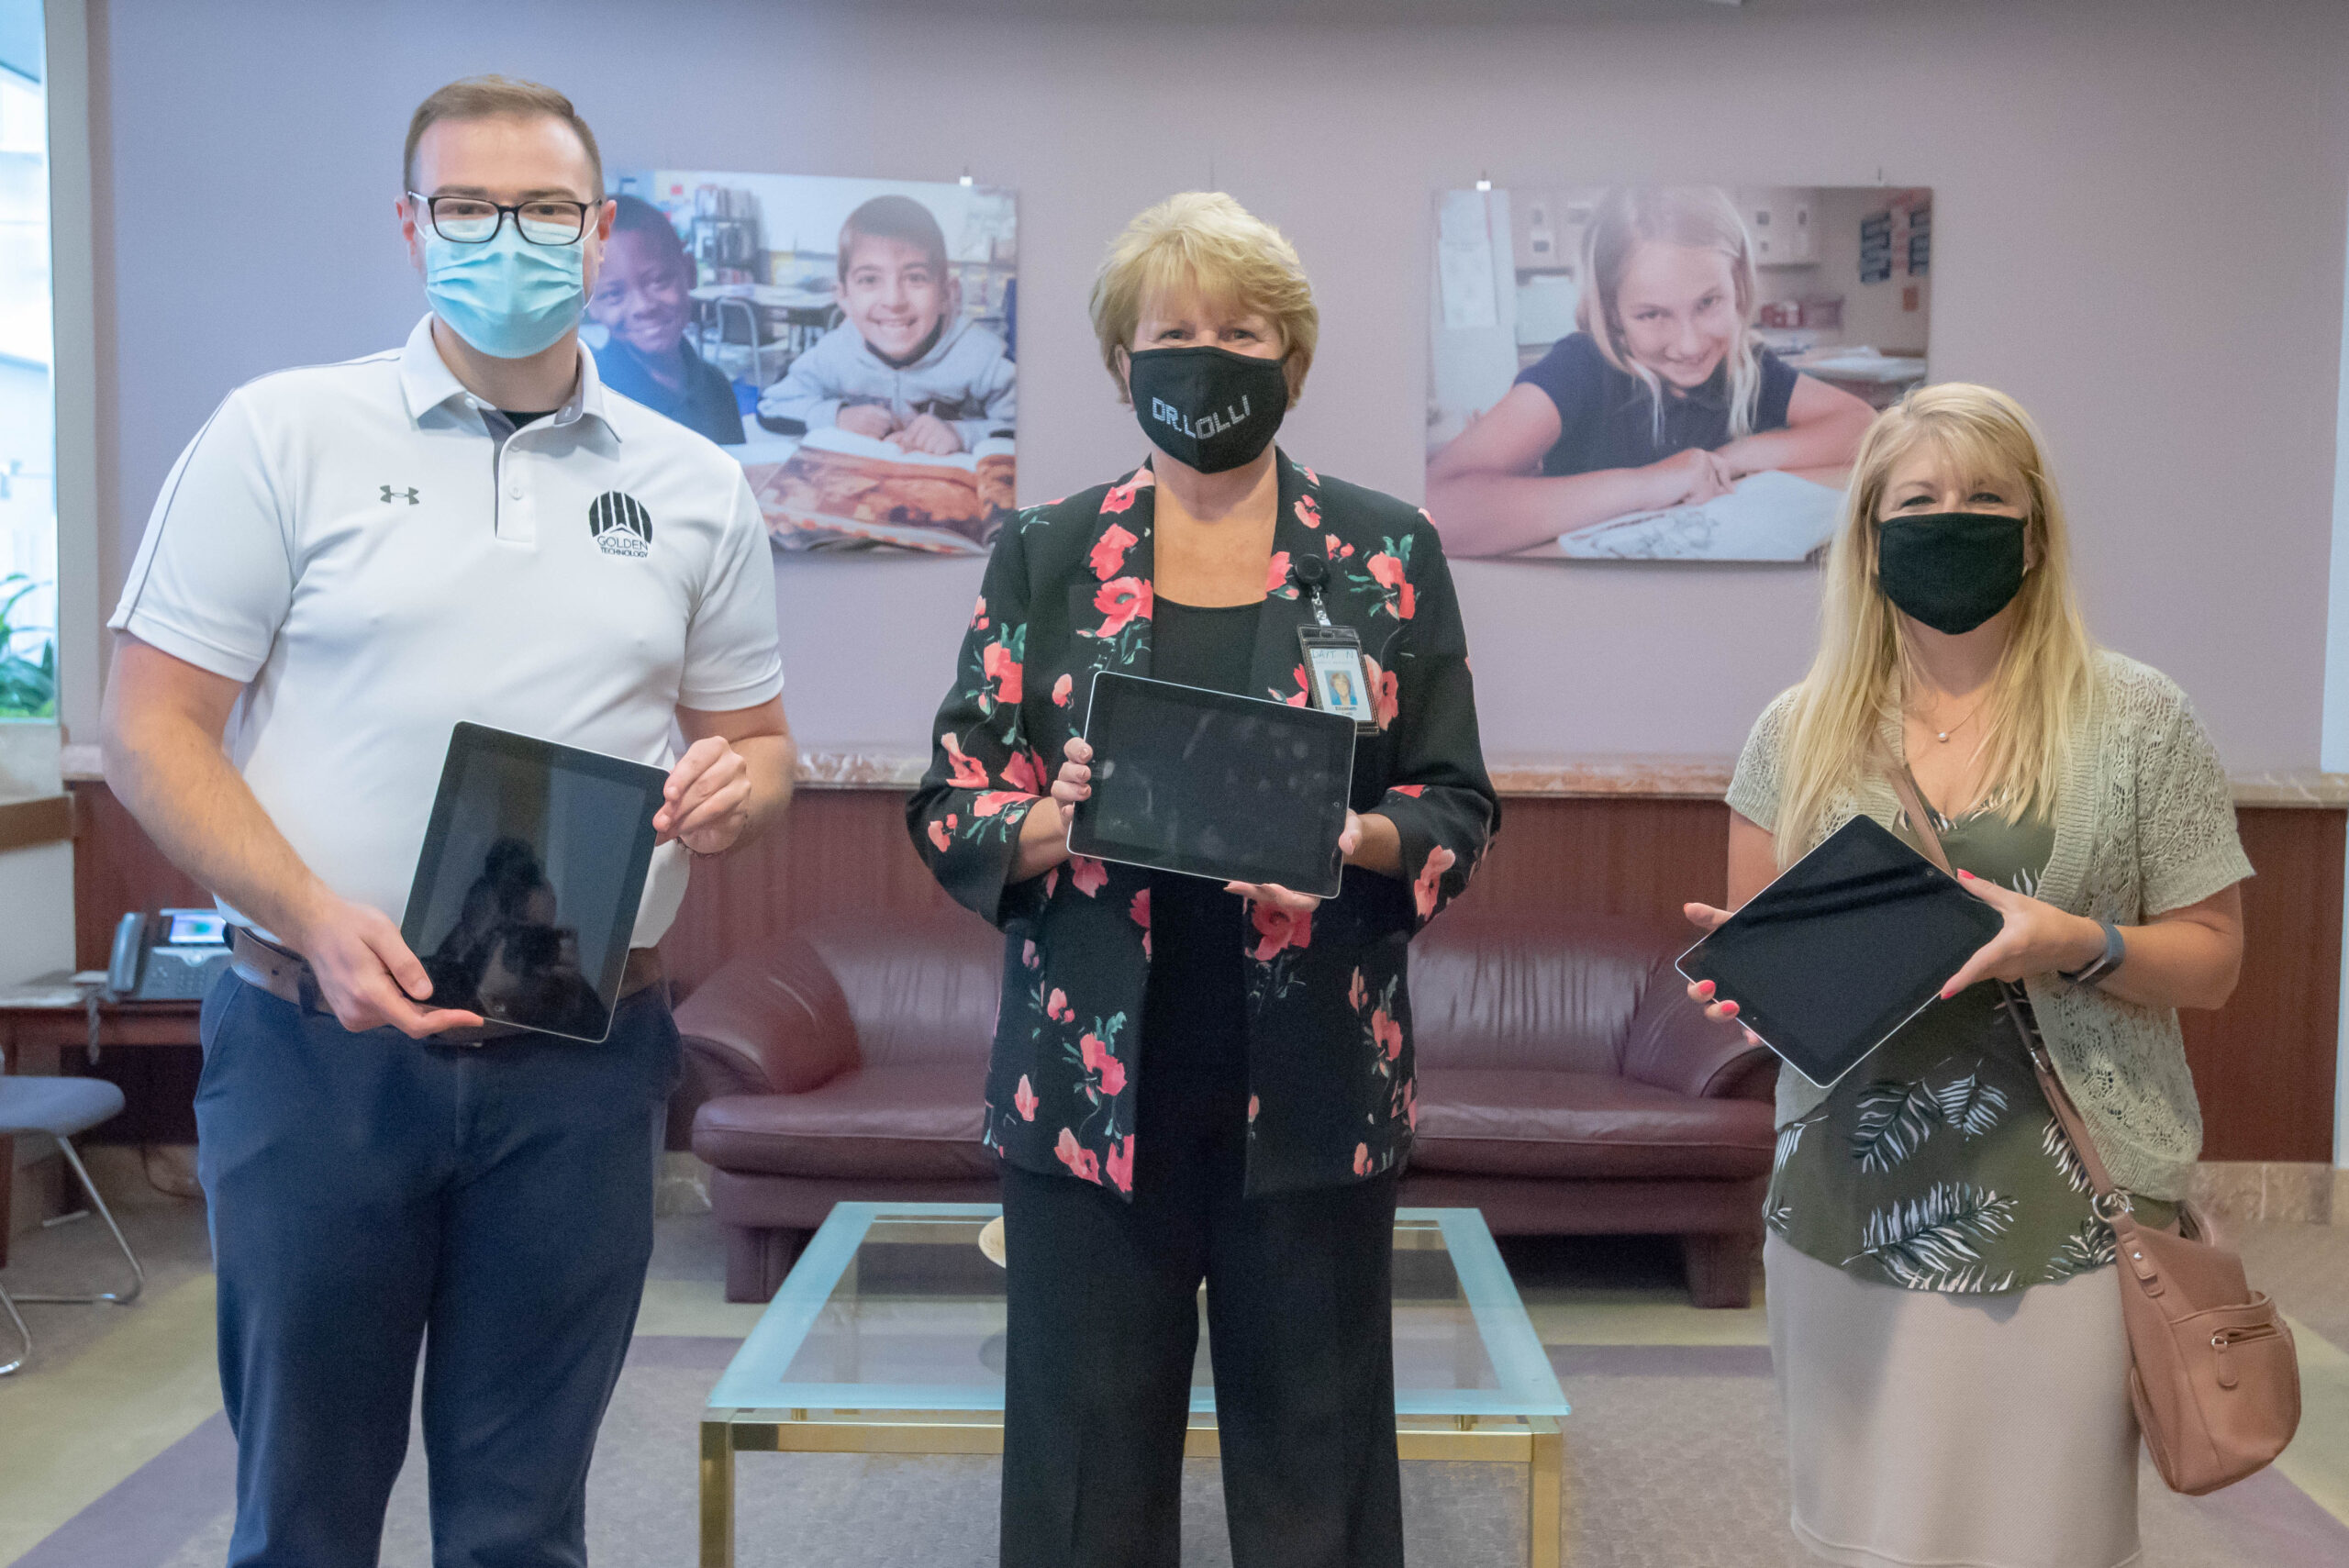 Golden Technology Donates Ipads to Dayton Schools